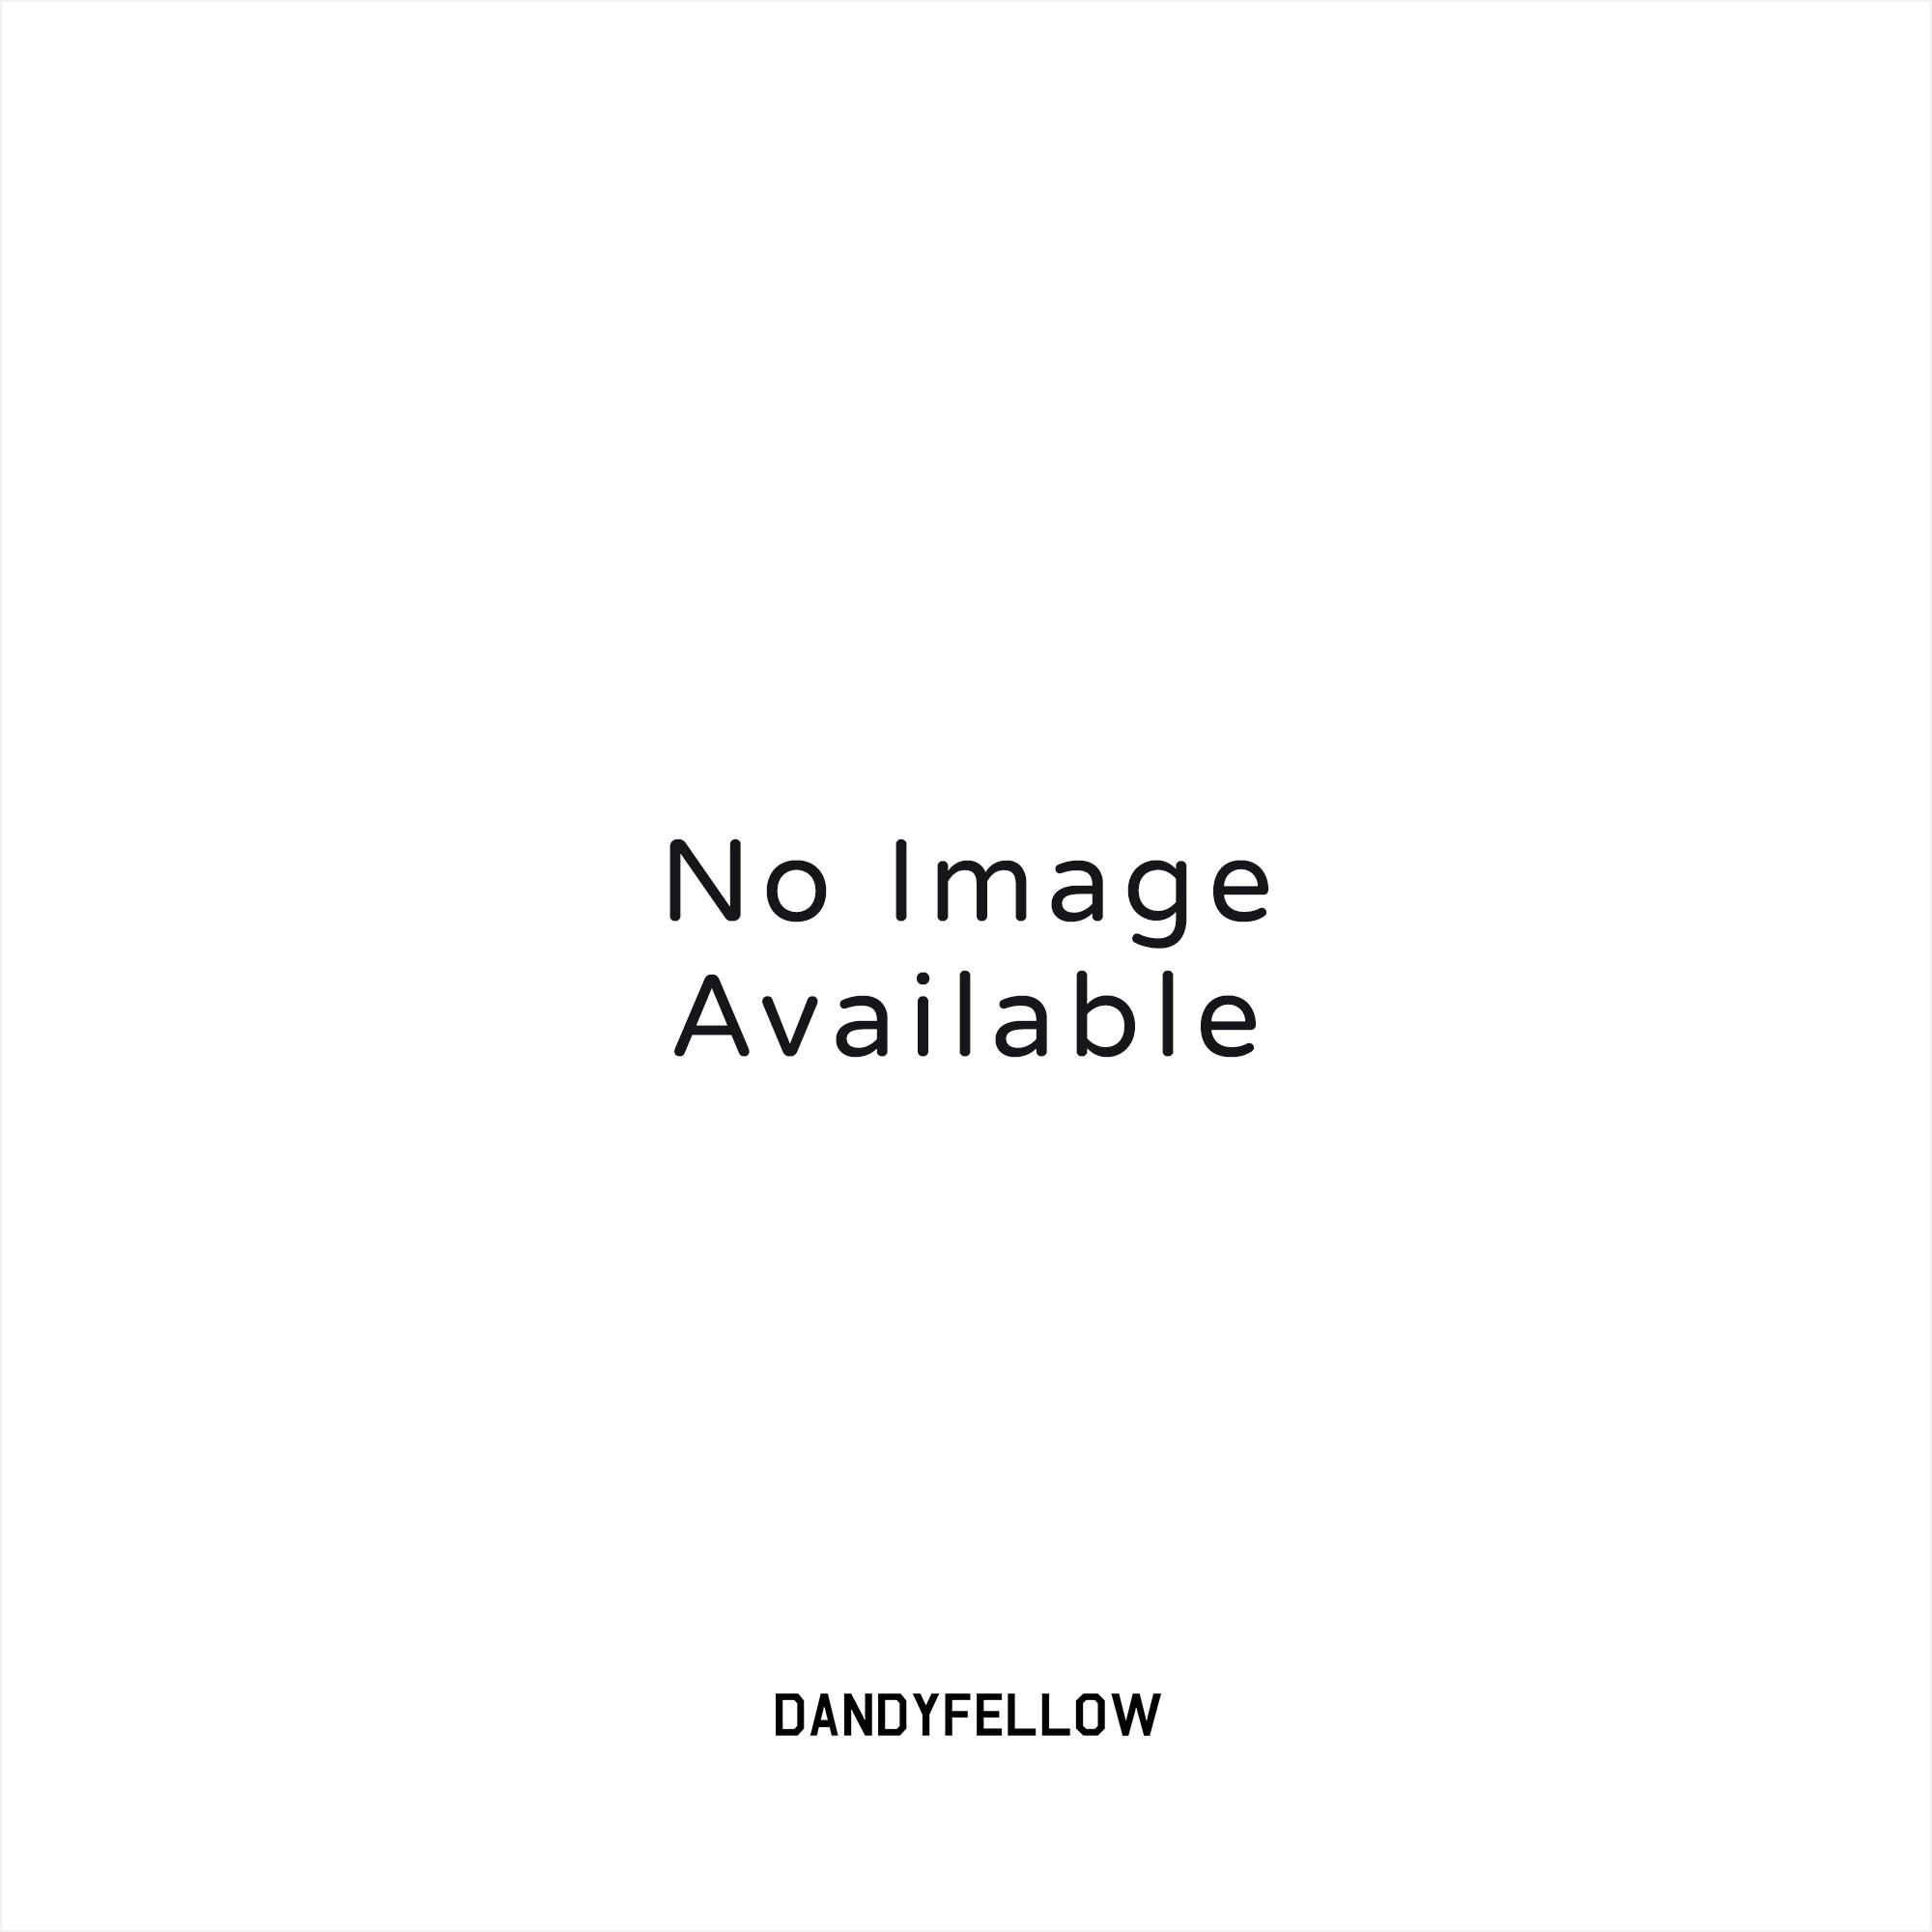 Paul Smith Merino Wool Tan Jumper PRXD-991P-220